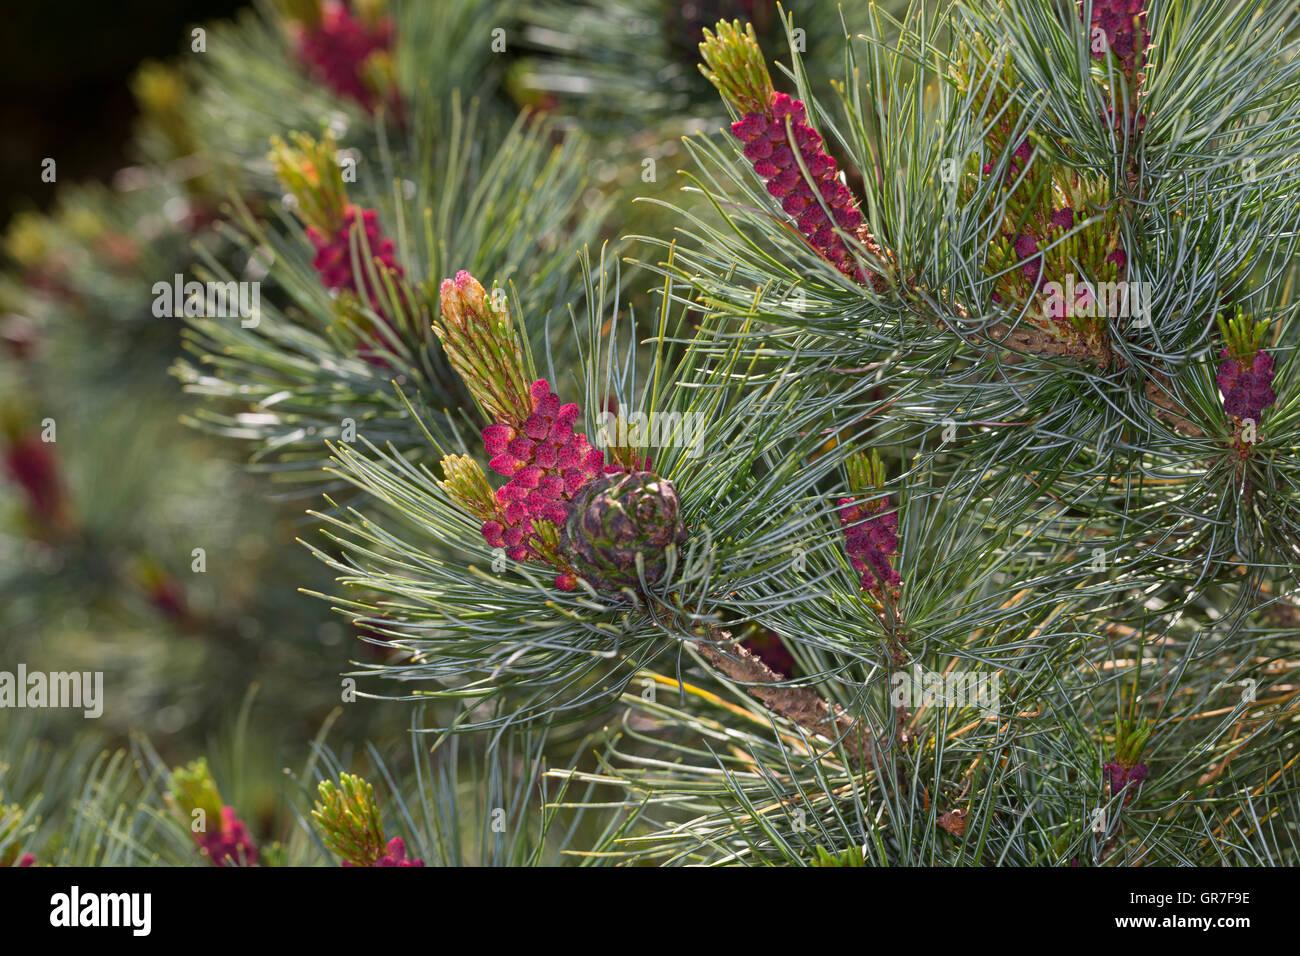 Schwarz-Kiefer, Schwarzkiefer, Kiefer, Blüte, Blüten, Pinus nigra, Pinus austriaca, Black Pine - Stock Image